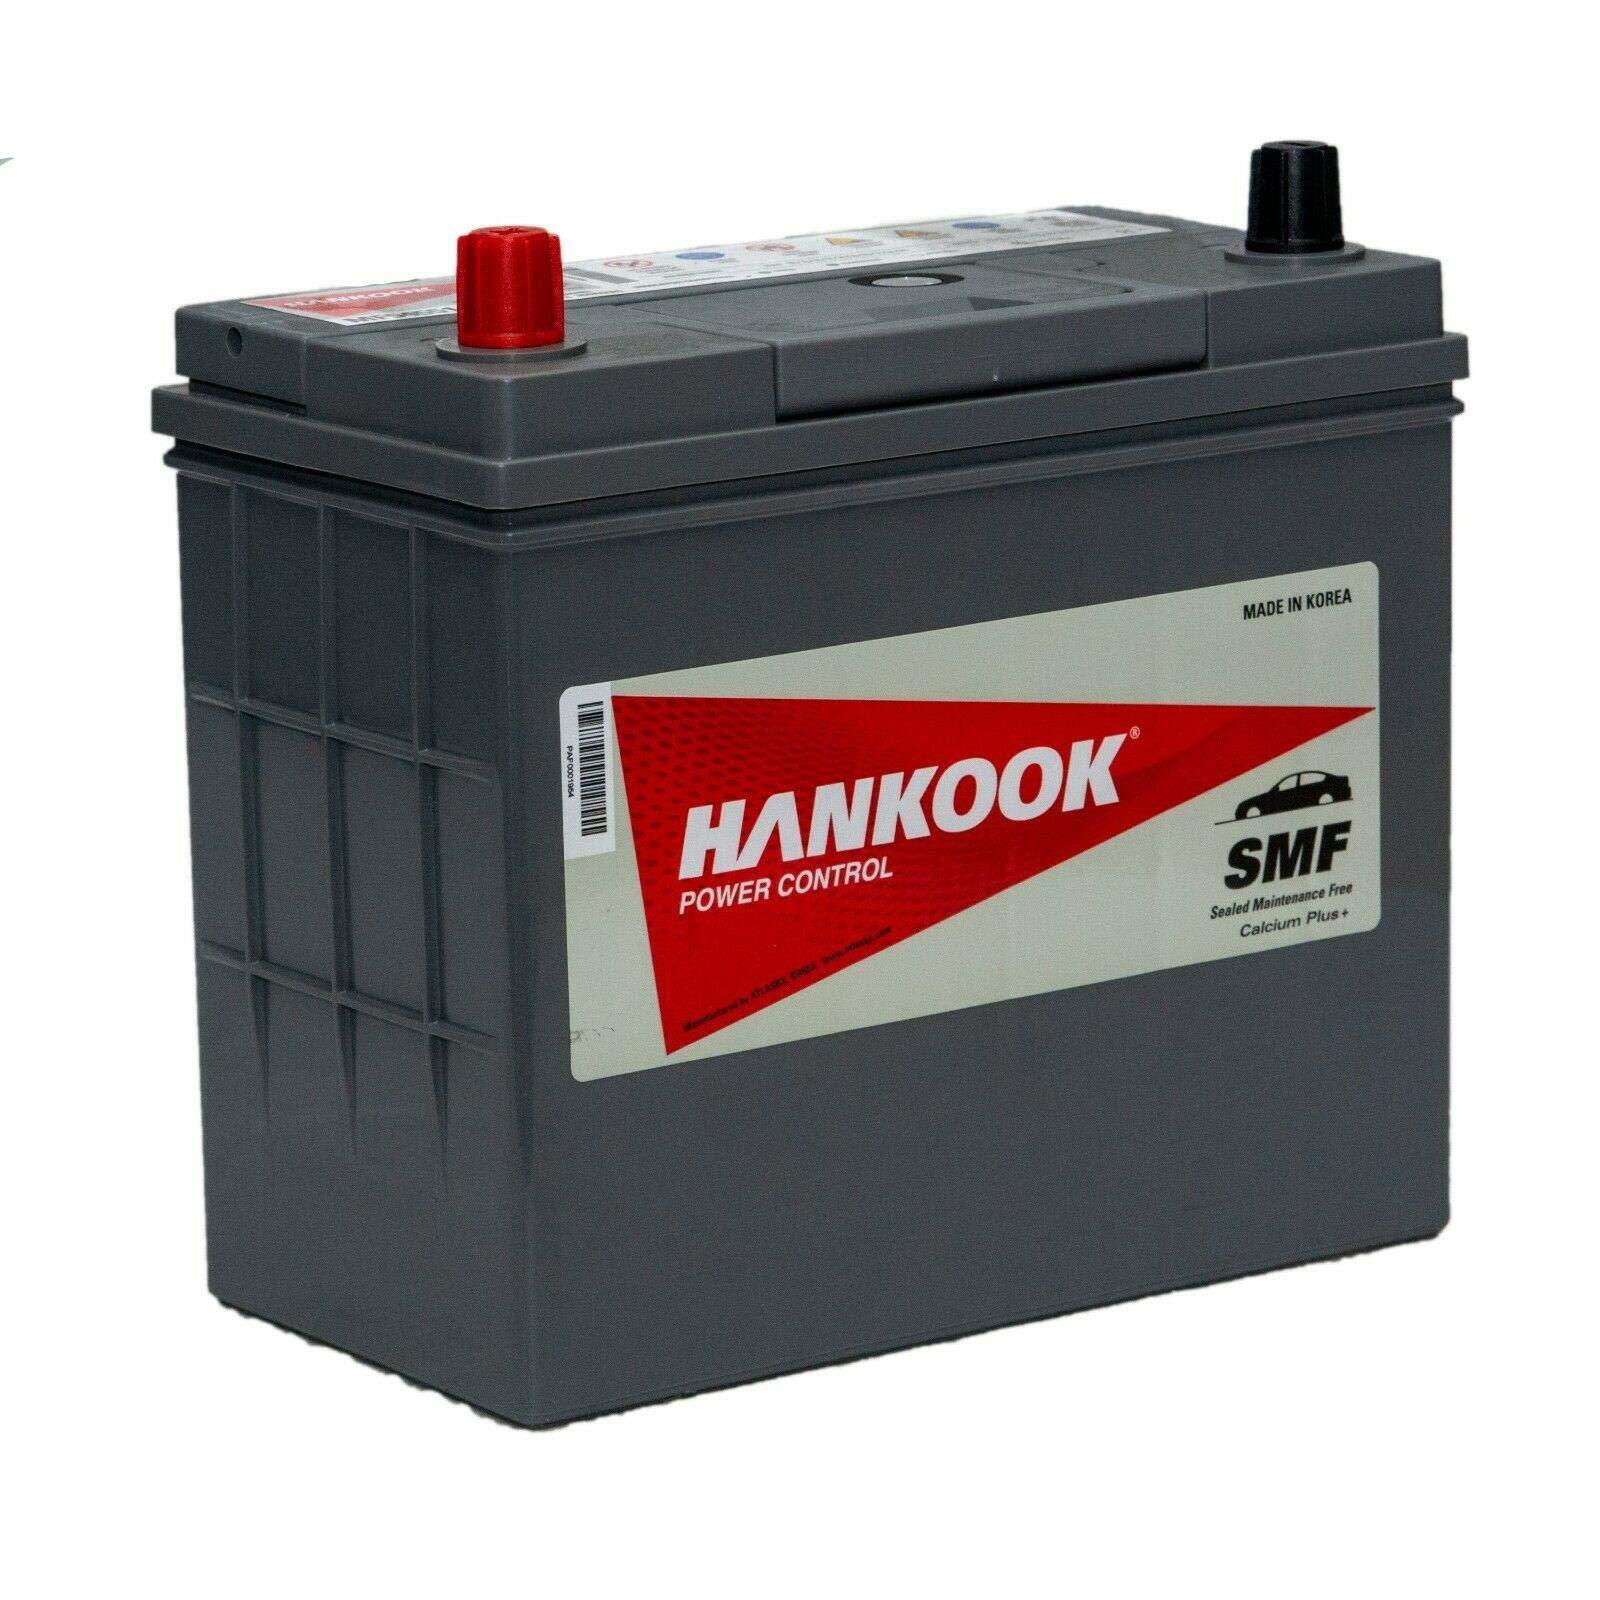 Hankook 057 Sealed Car Battery 12V 72Ah 4 Year Warranty 278 x 175 x 190mm MF54551